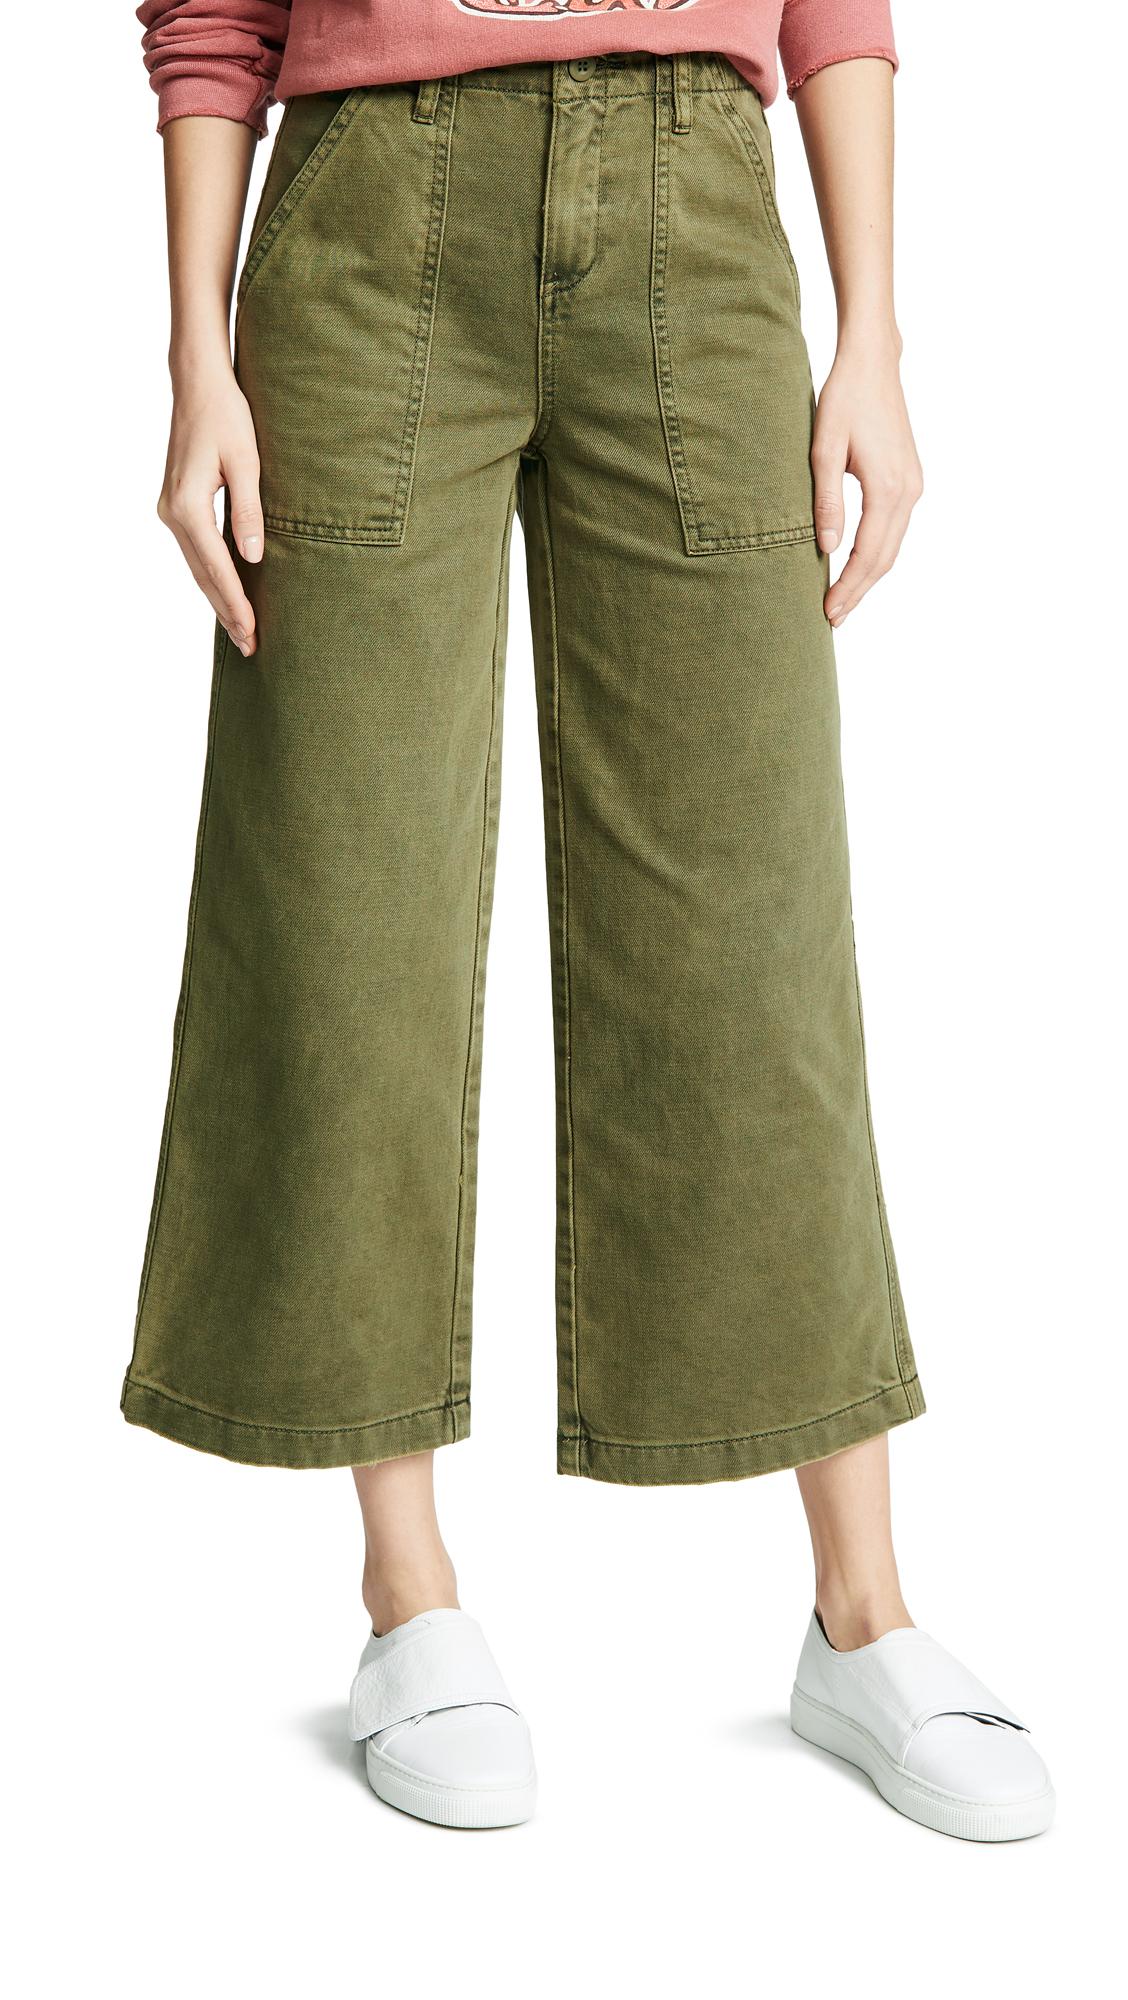 Blank Denim Wide Leg Utility Pants In Sticks & Stones